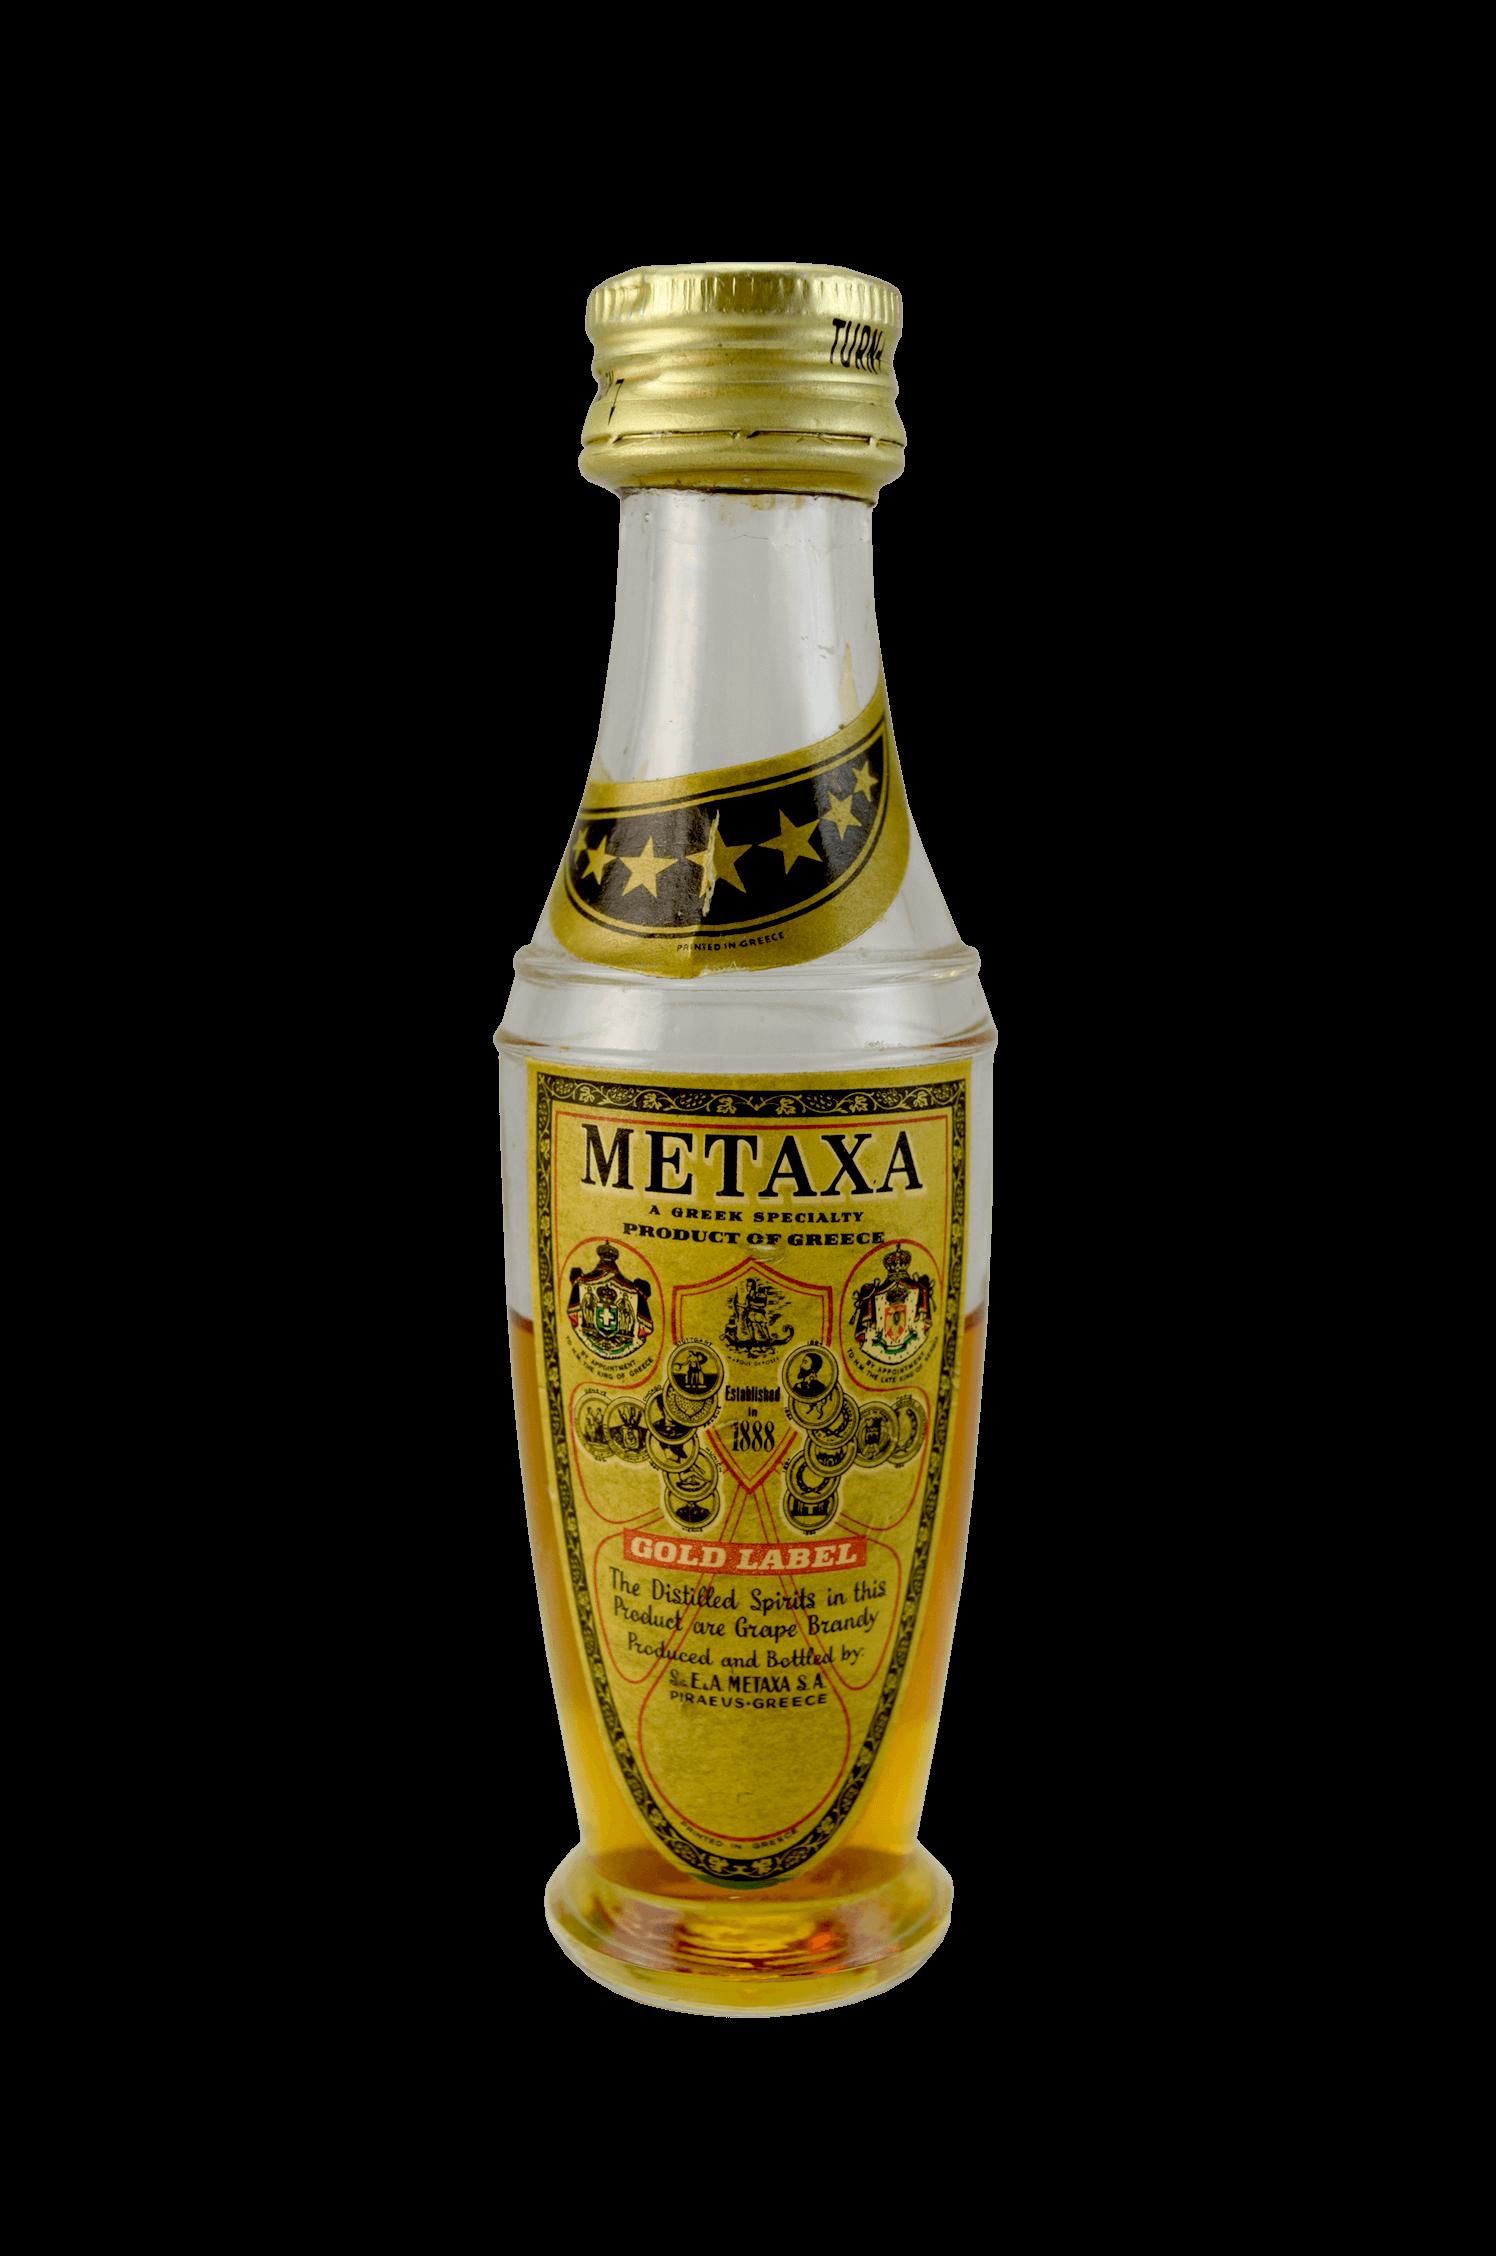 Metaxa Gold Label